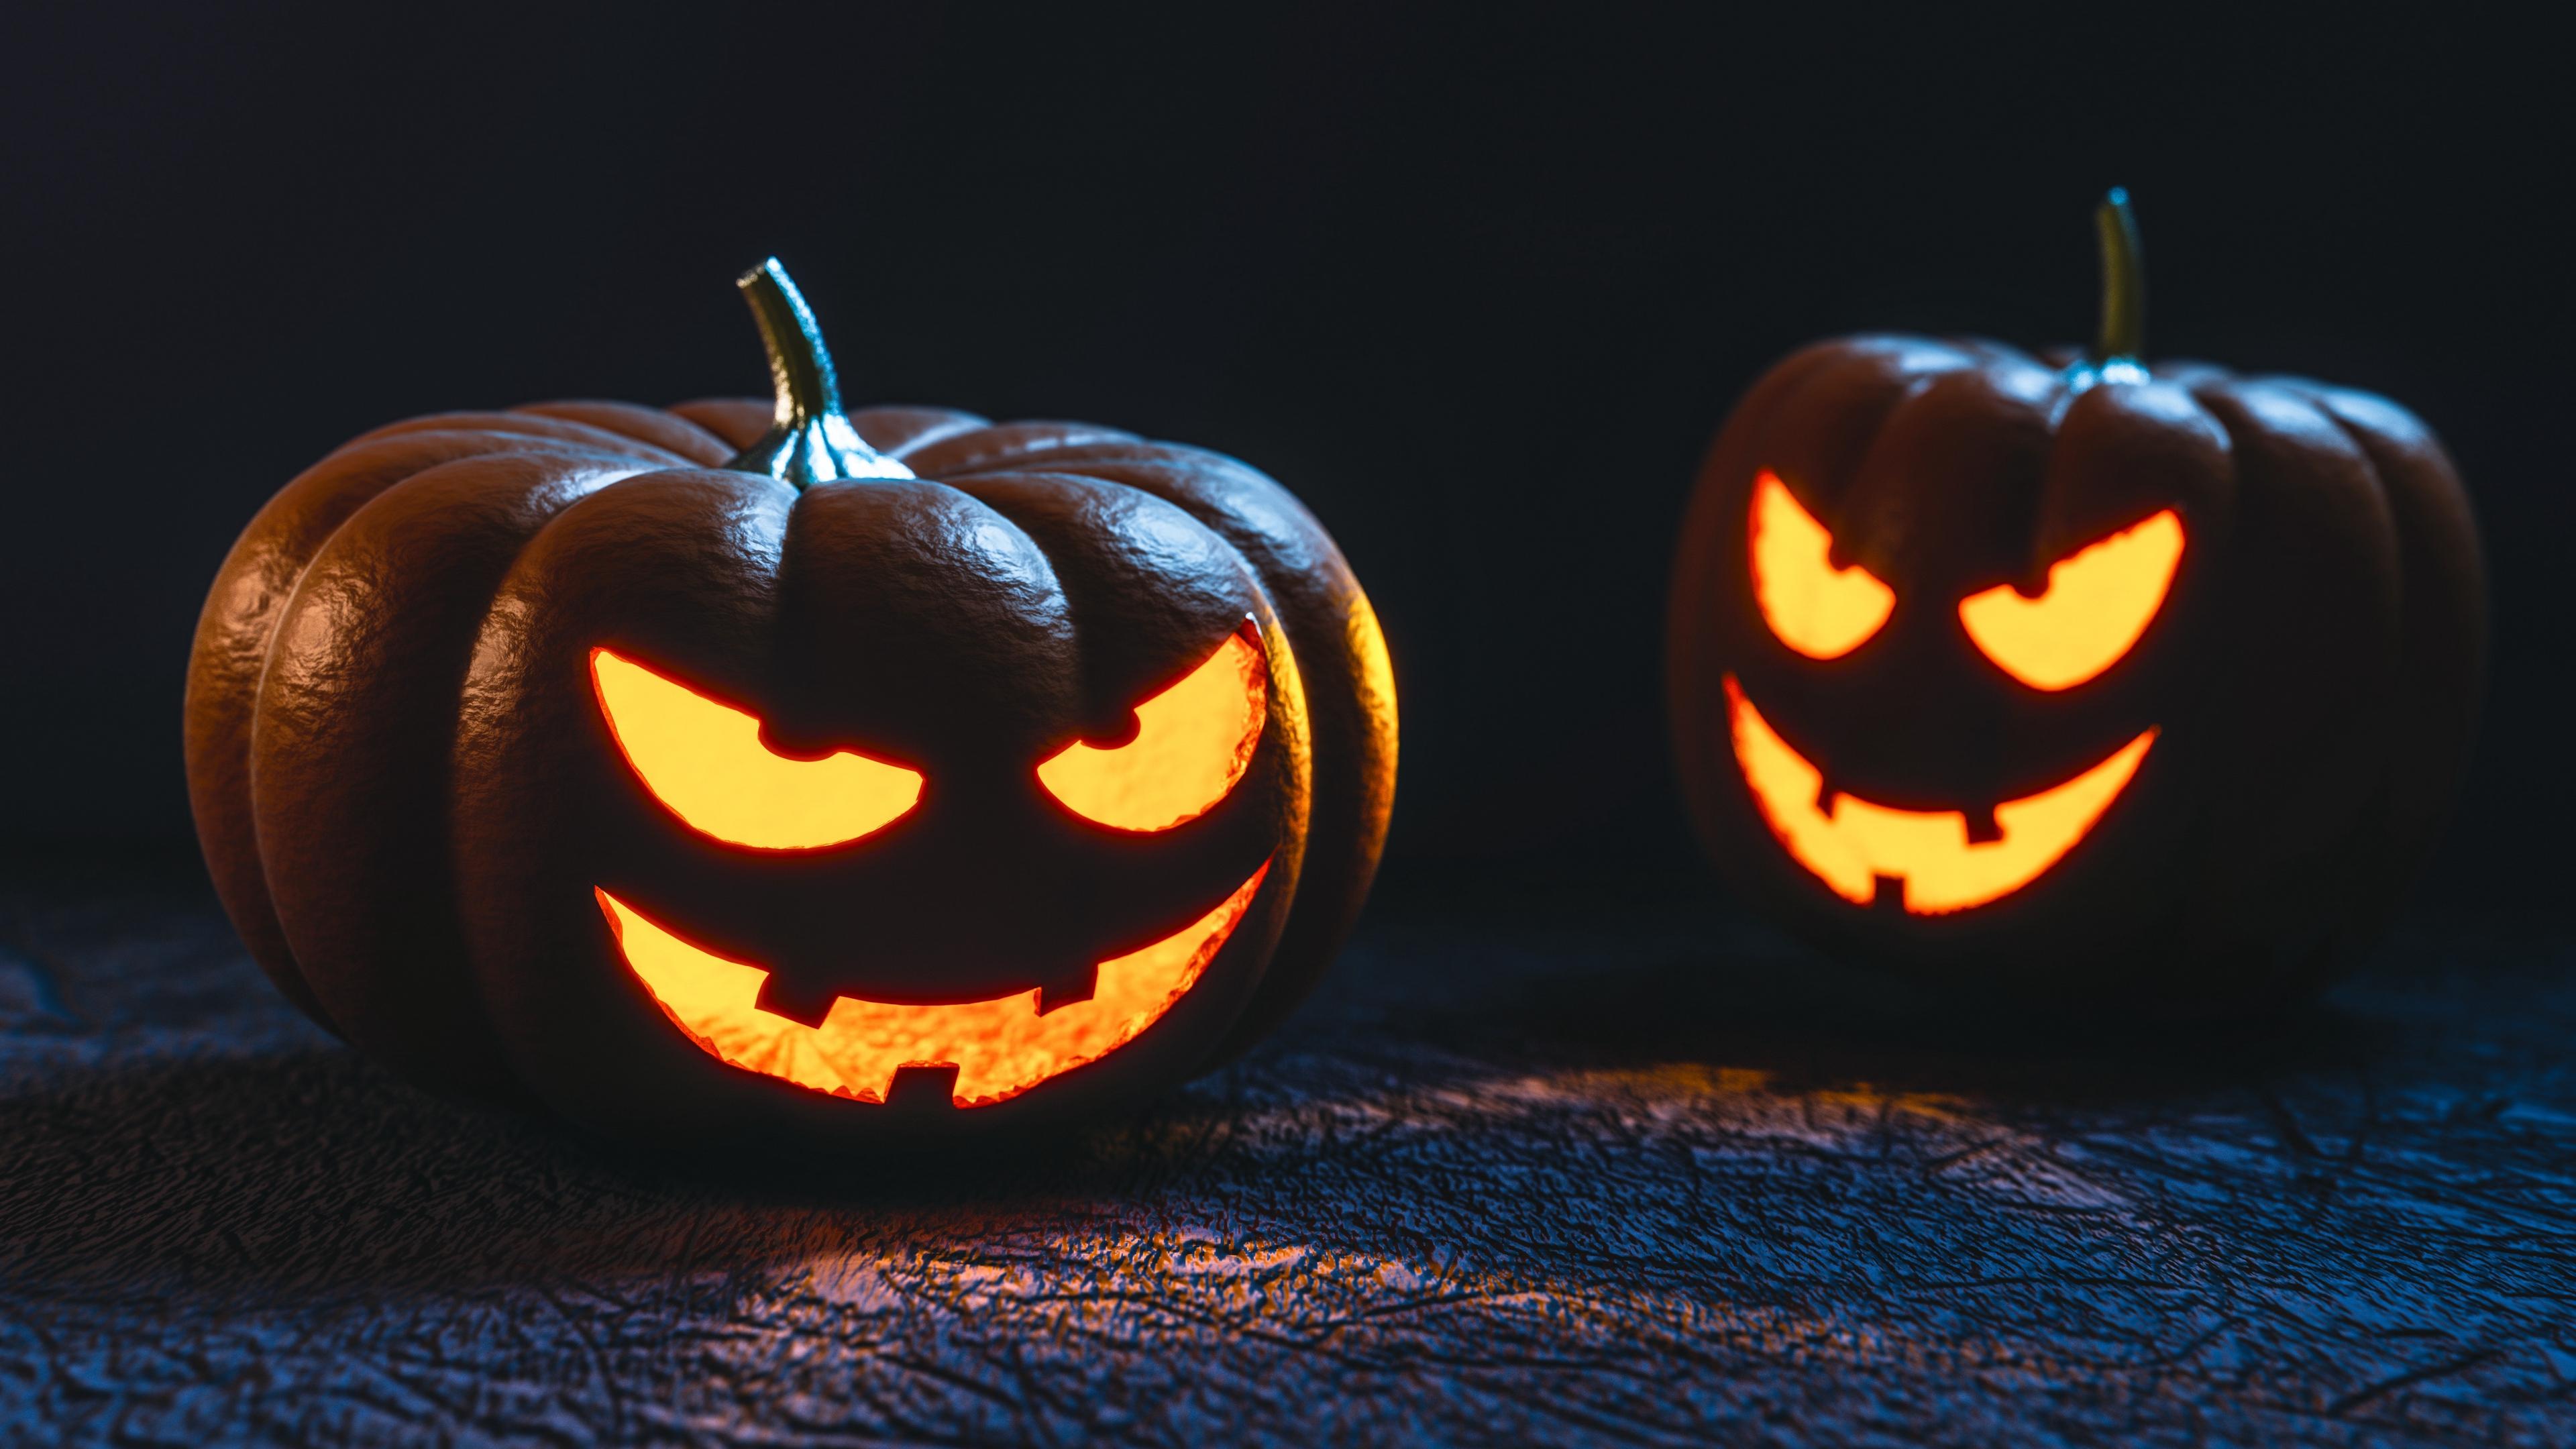 pumpkin halloween mask 4k 1538344864 - pumpkin, halloween, mask 4k - pumpkin, Mask, halloween